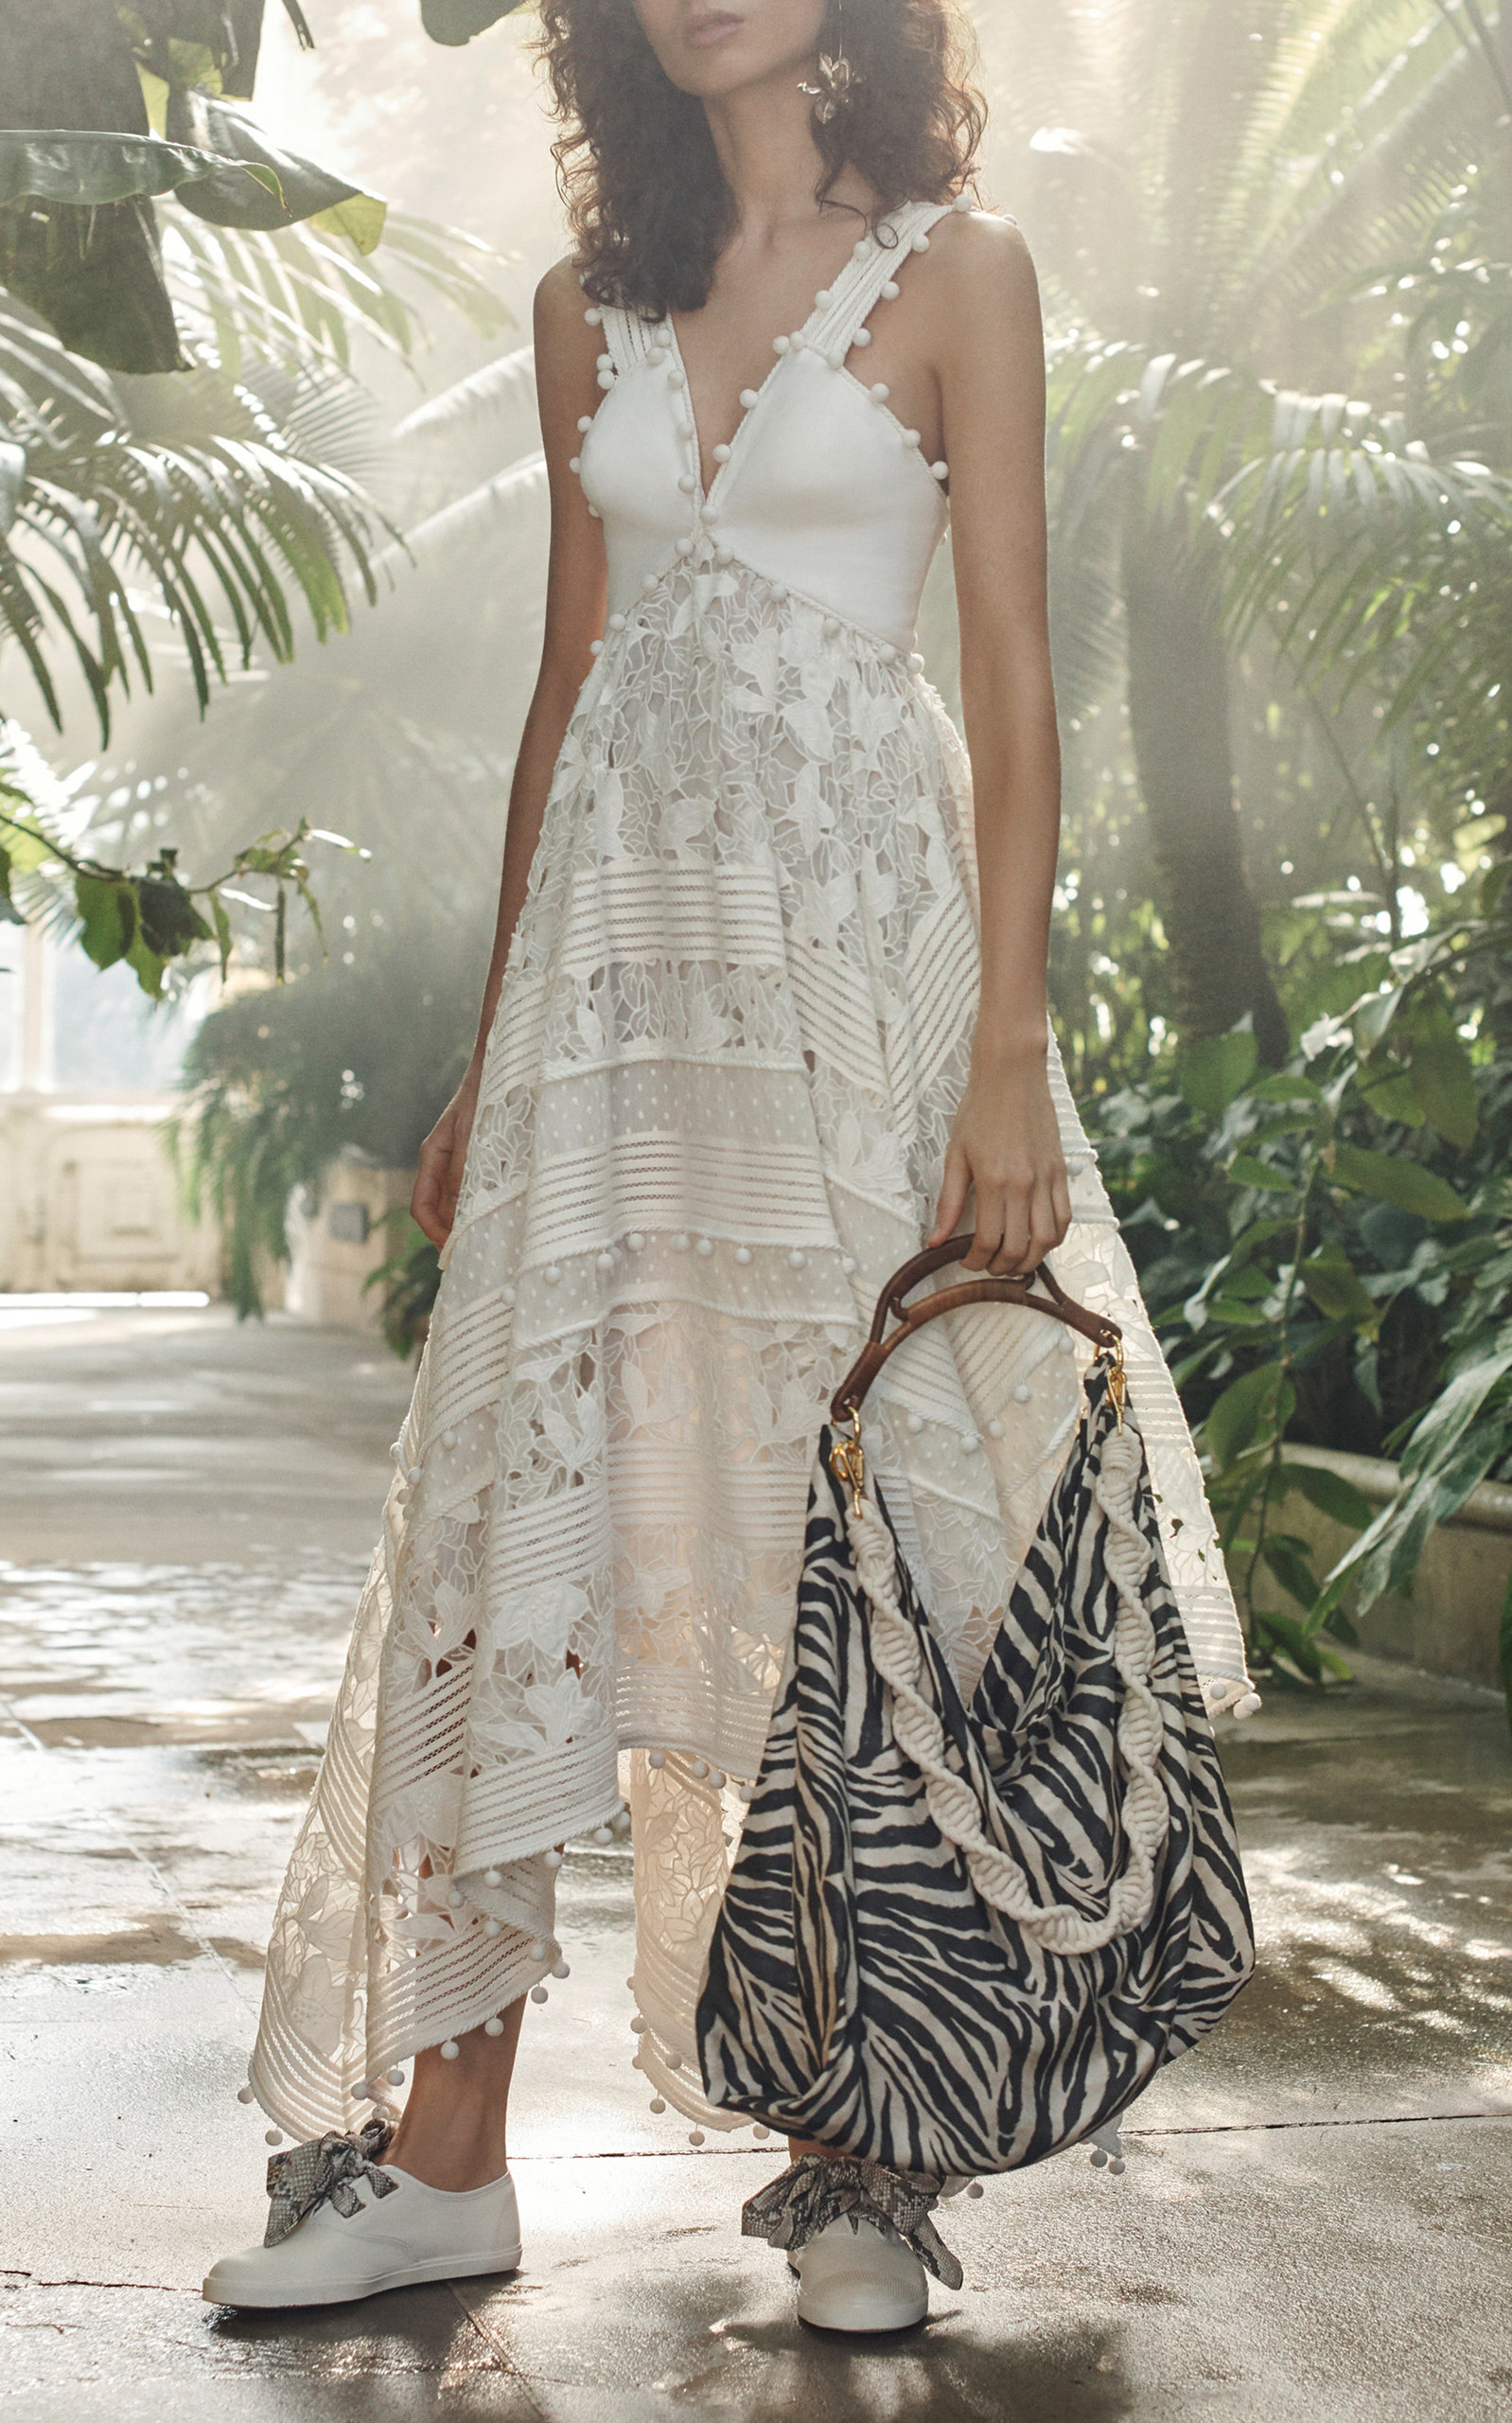 2abfaee5796b ZimmermannCorsage Embellished Silk-Blend Midi Dress. CLOSE. Loading. Loading.  Loading. Loading